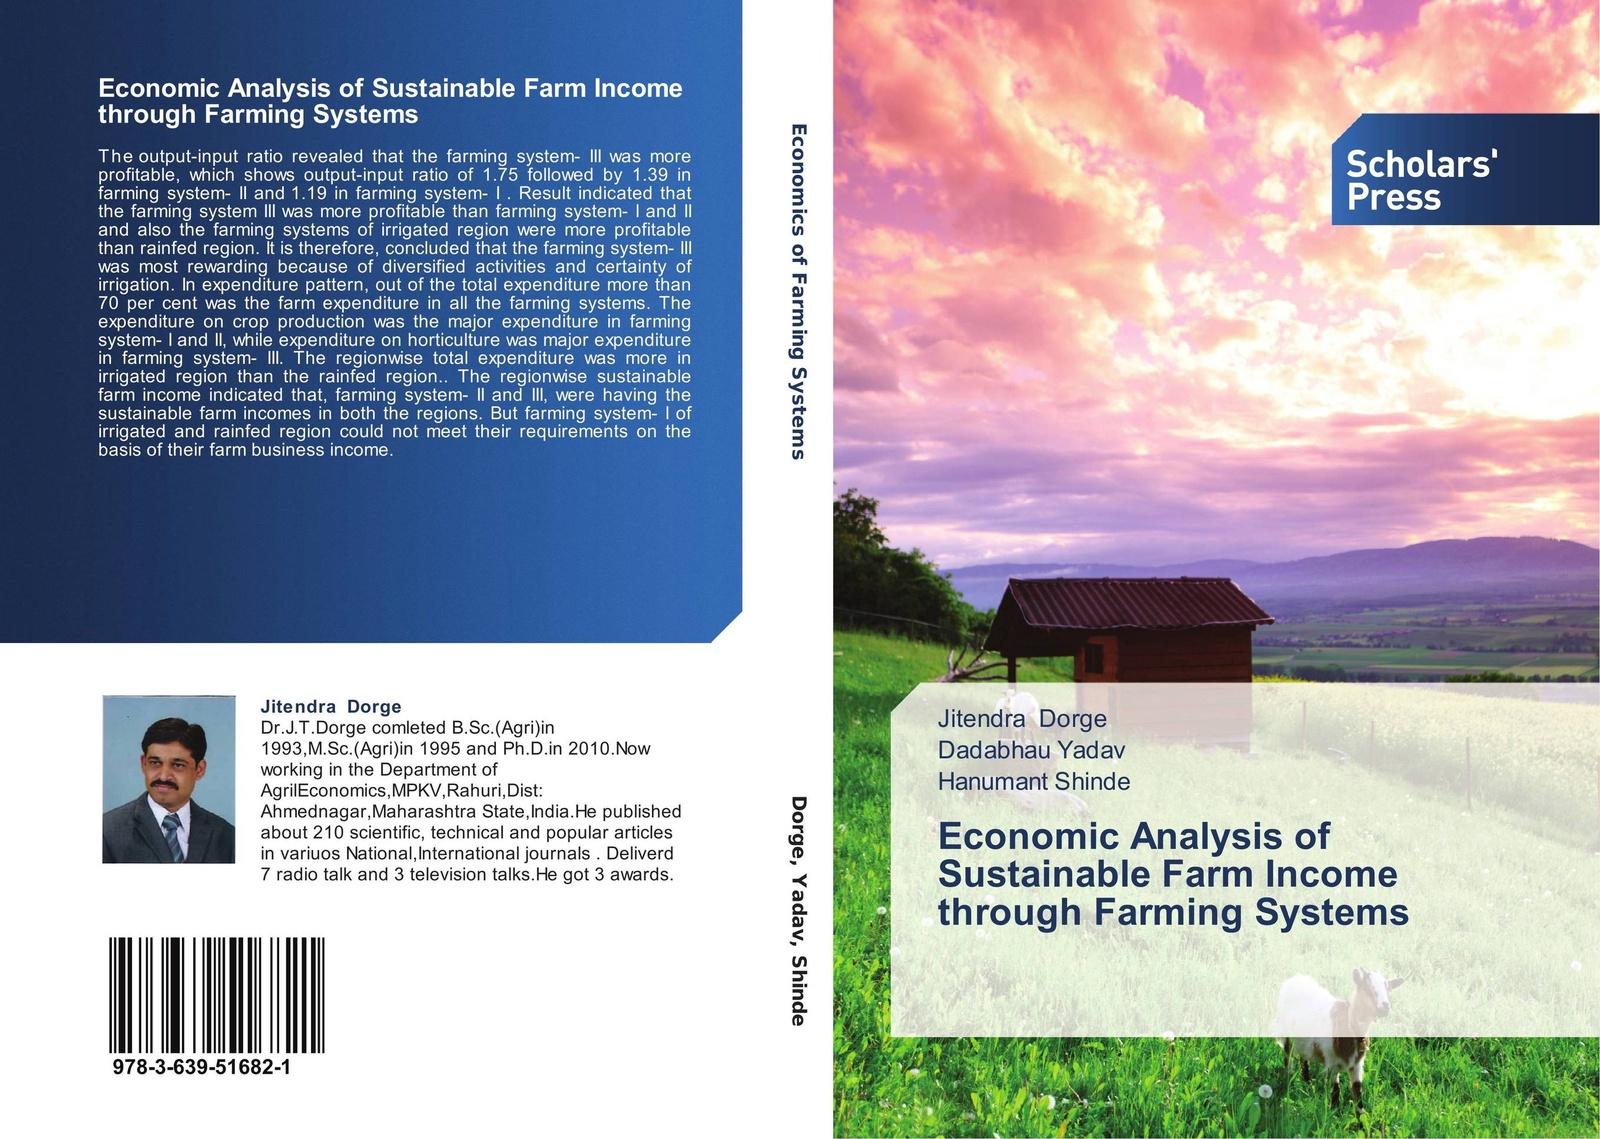 Jitendra Dorge,Dadabhau Yadav and Hanumant Shinde Economic Analysis of Sustainable Farm Income through Farming Systems цена